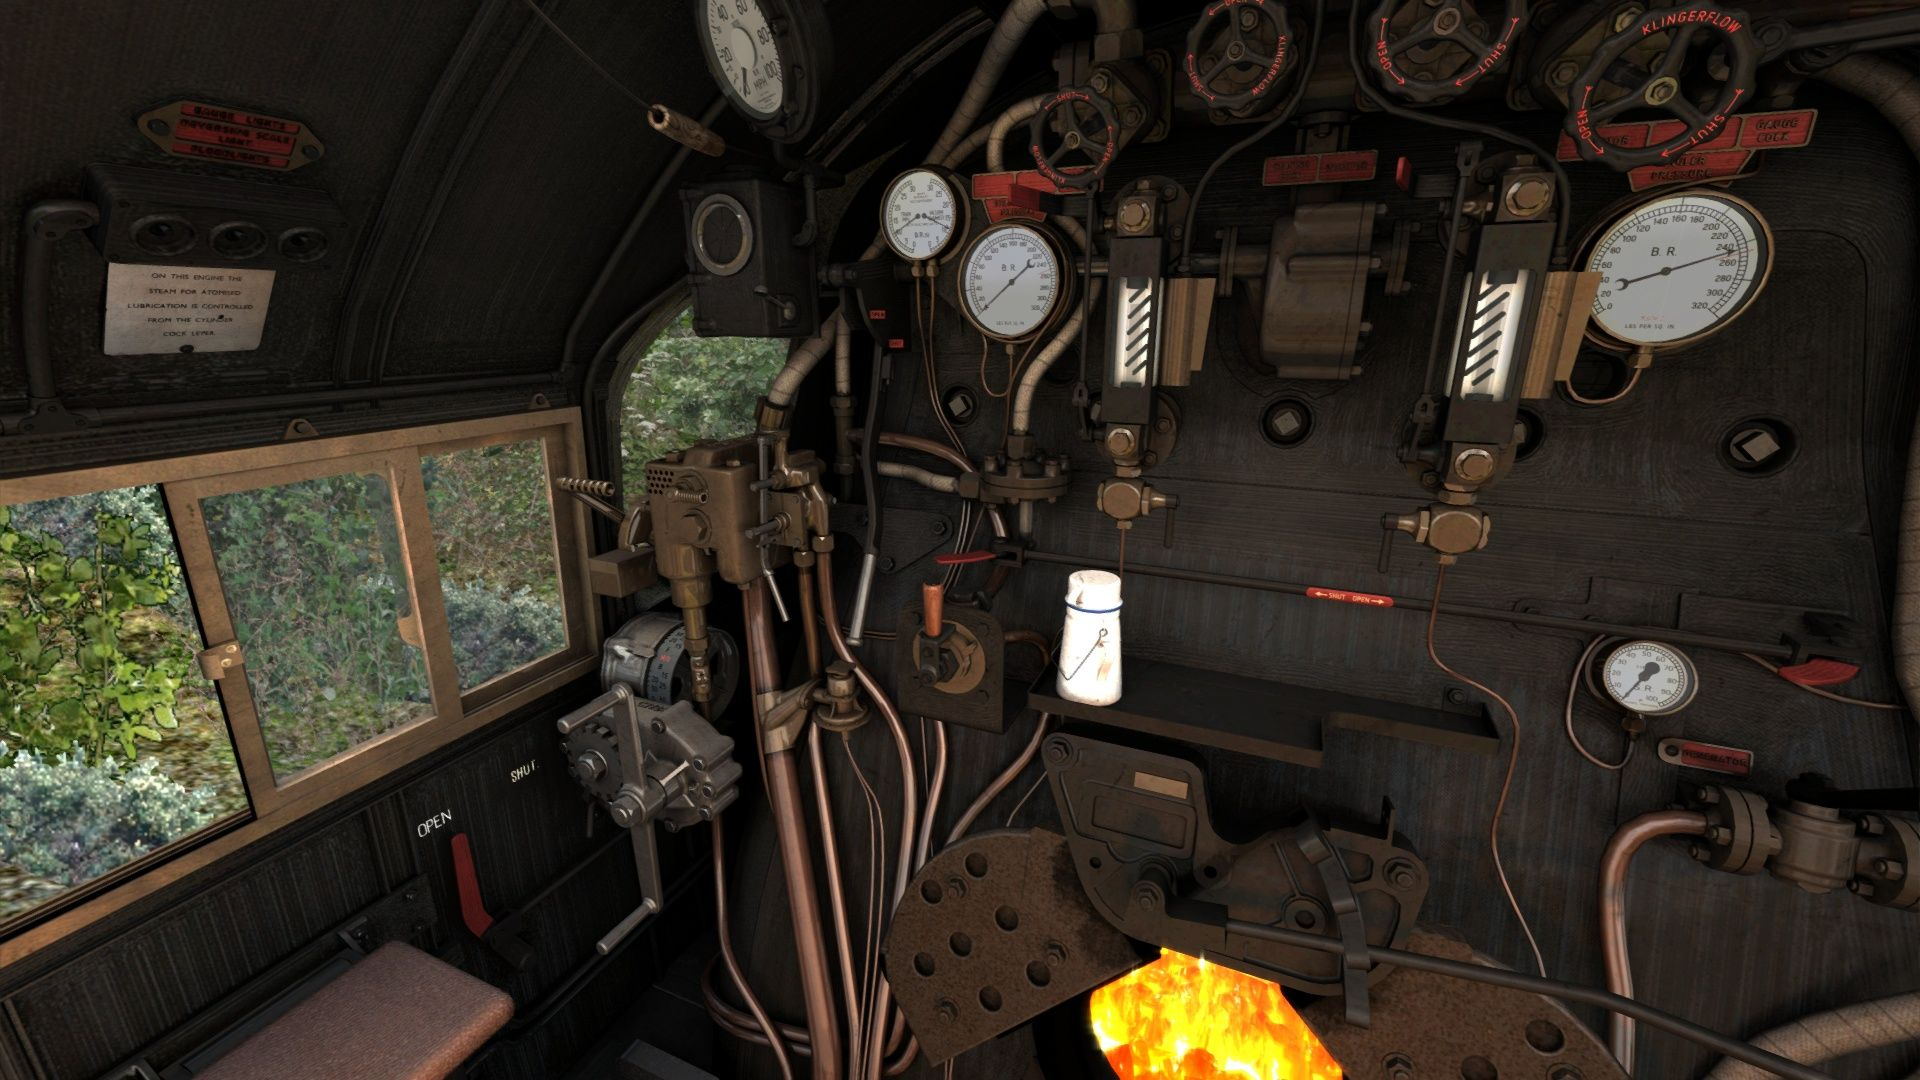 Screenshot_Chatham Main & Medway Valley Lines_51.47488--0.14348_14-01-53.jpg